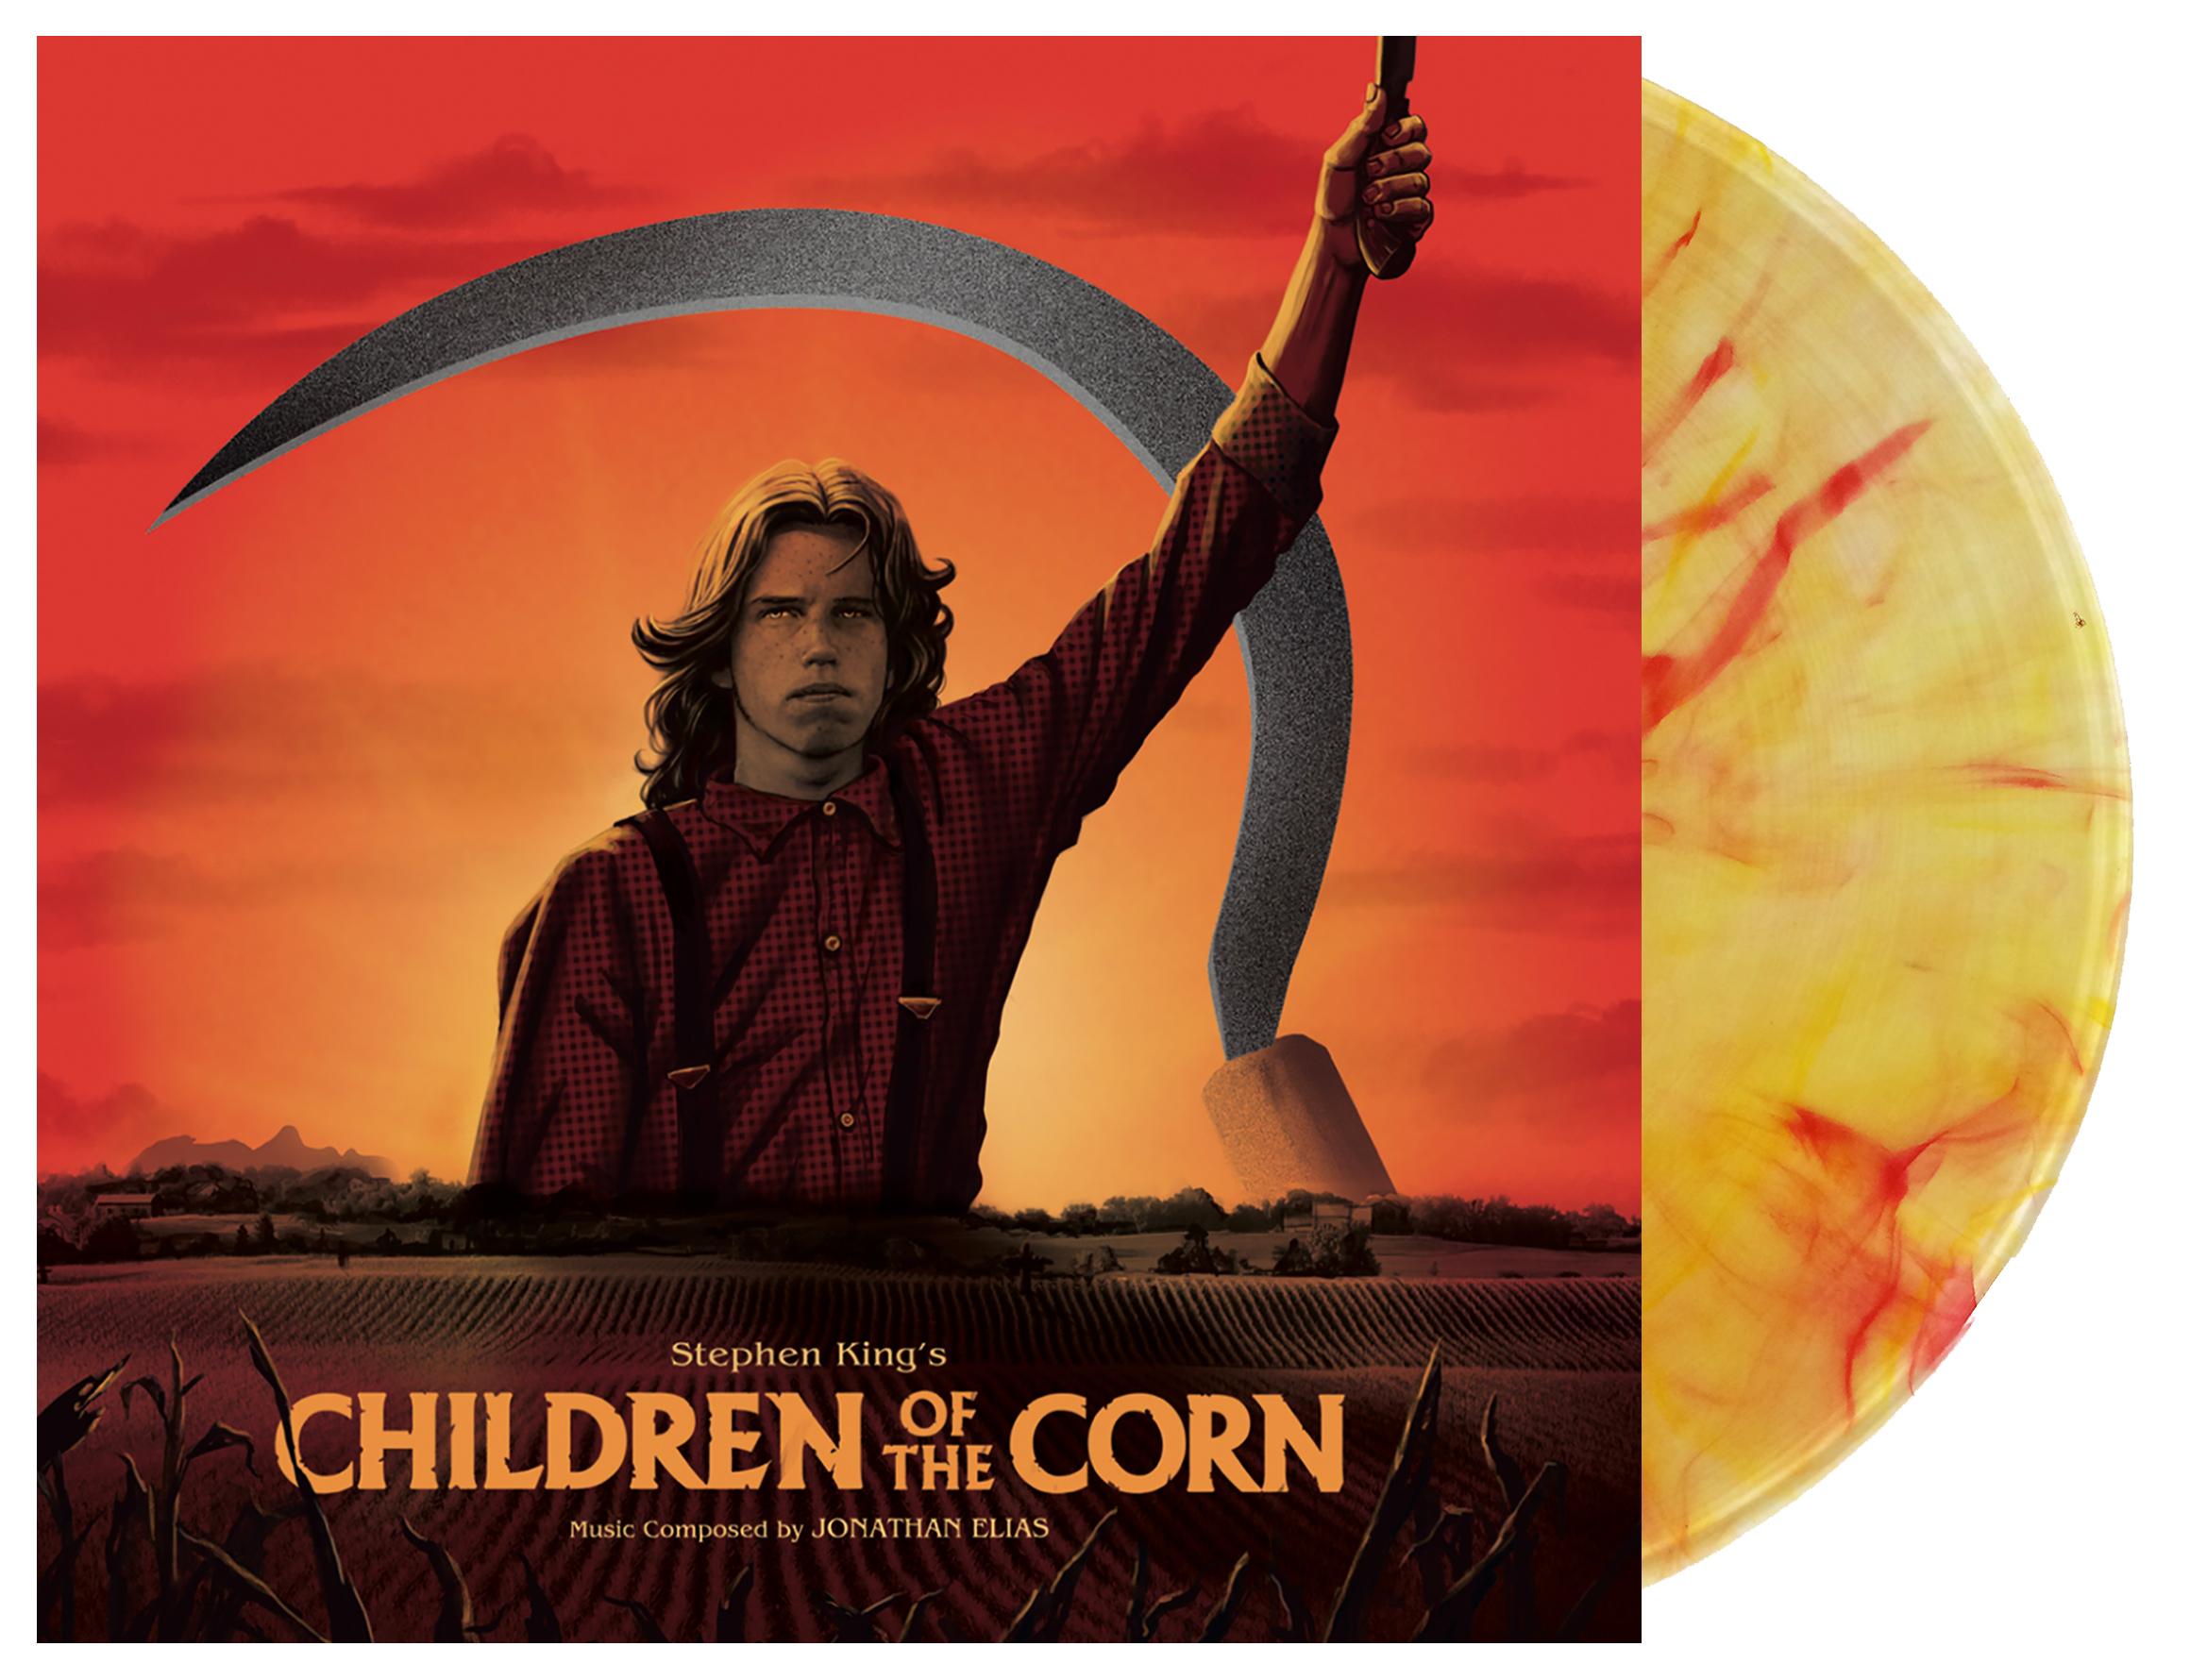 Children Of The Corn (Stephen King's 1984 Soundtrack)